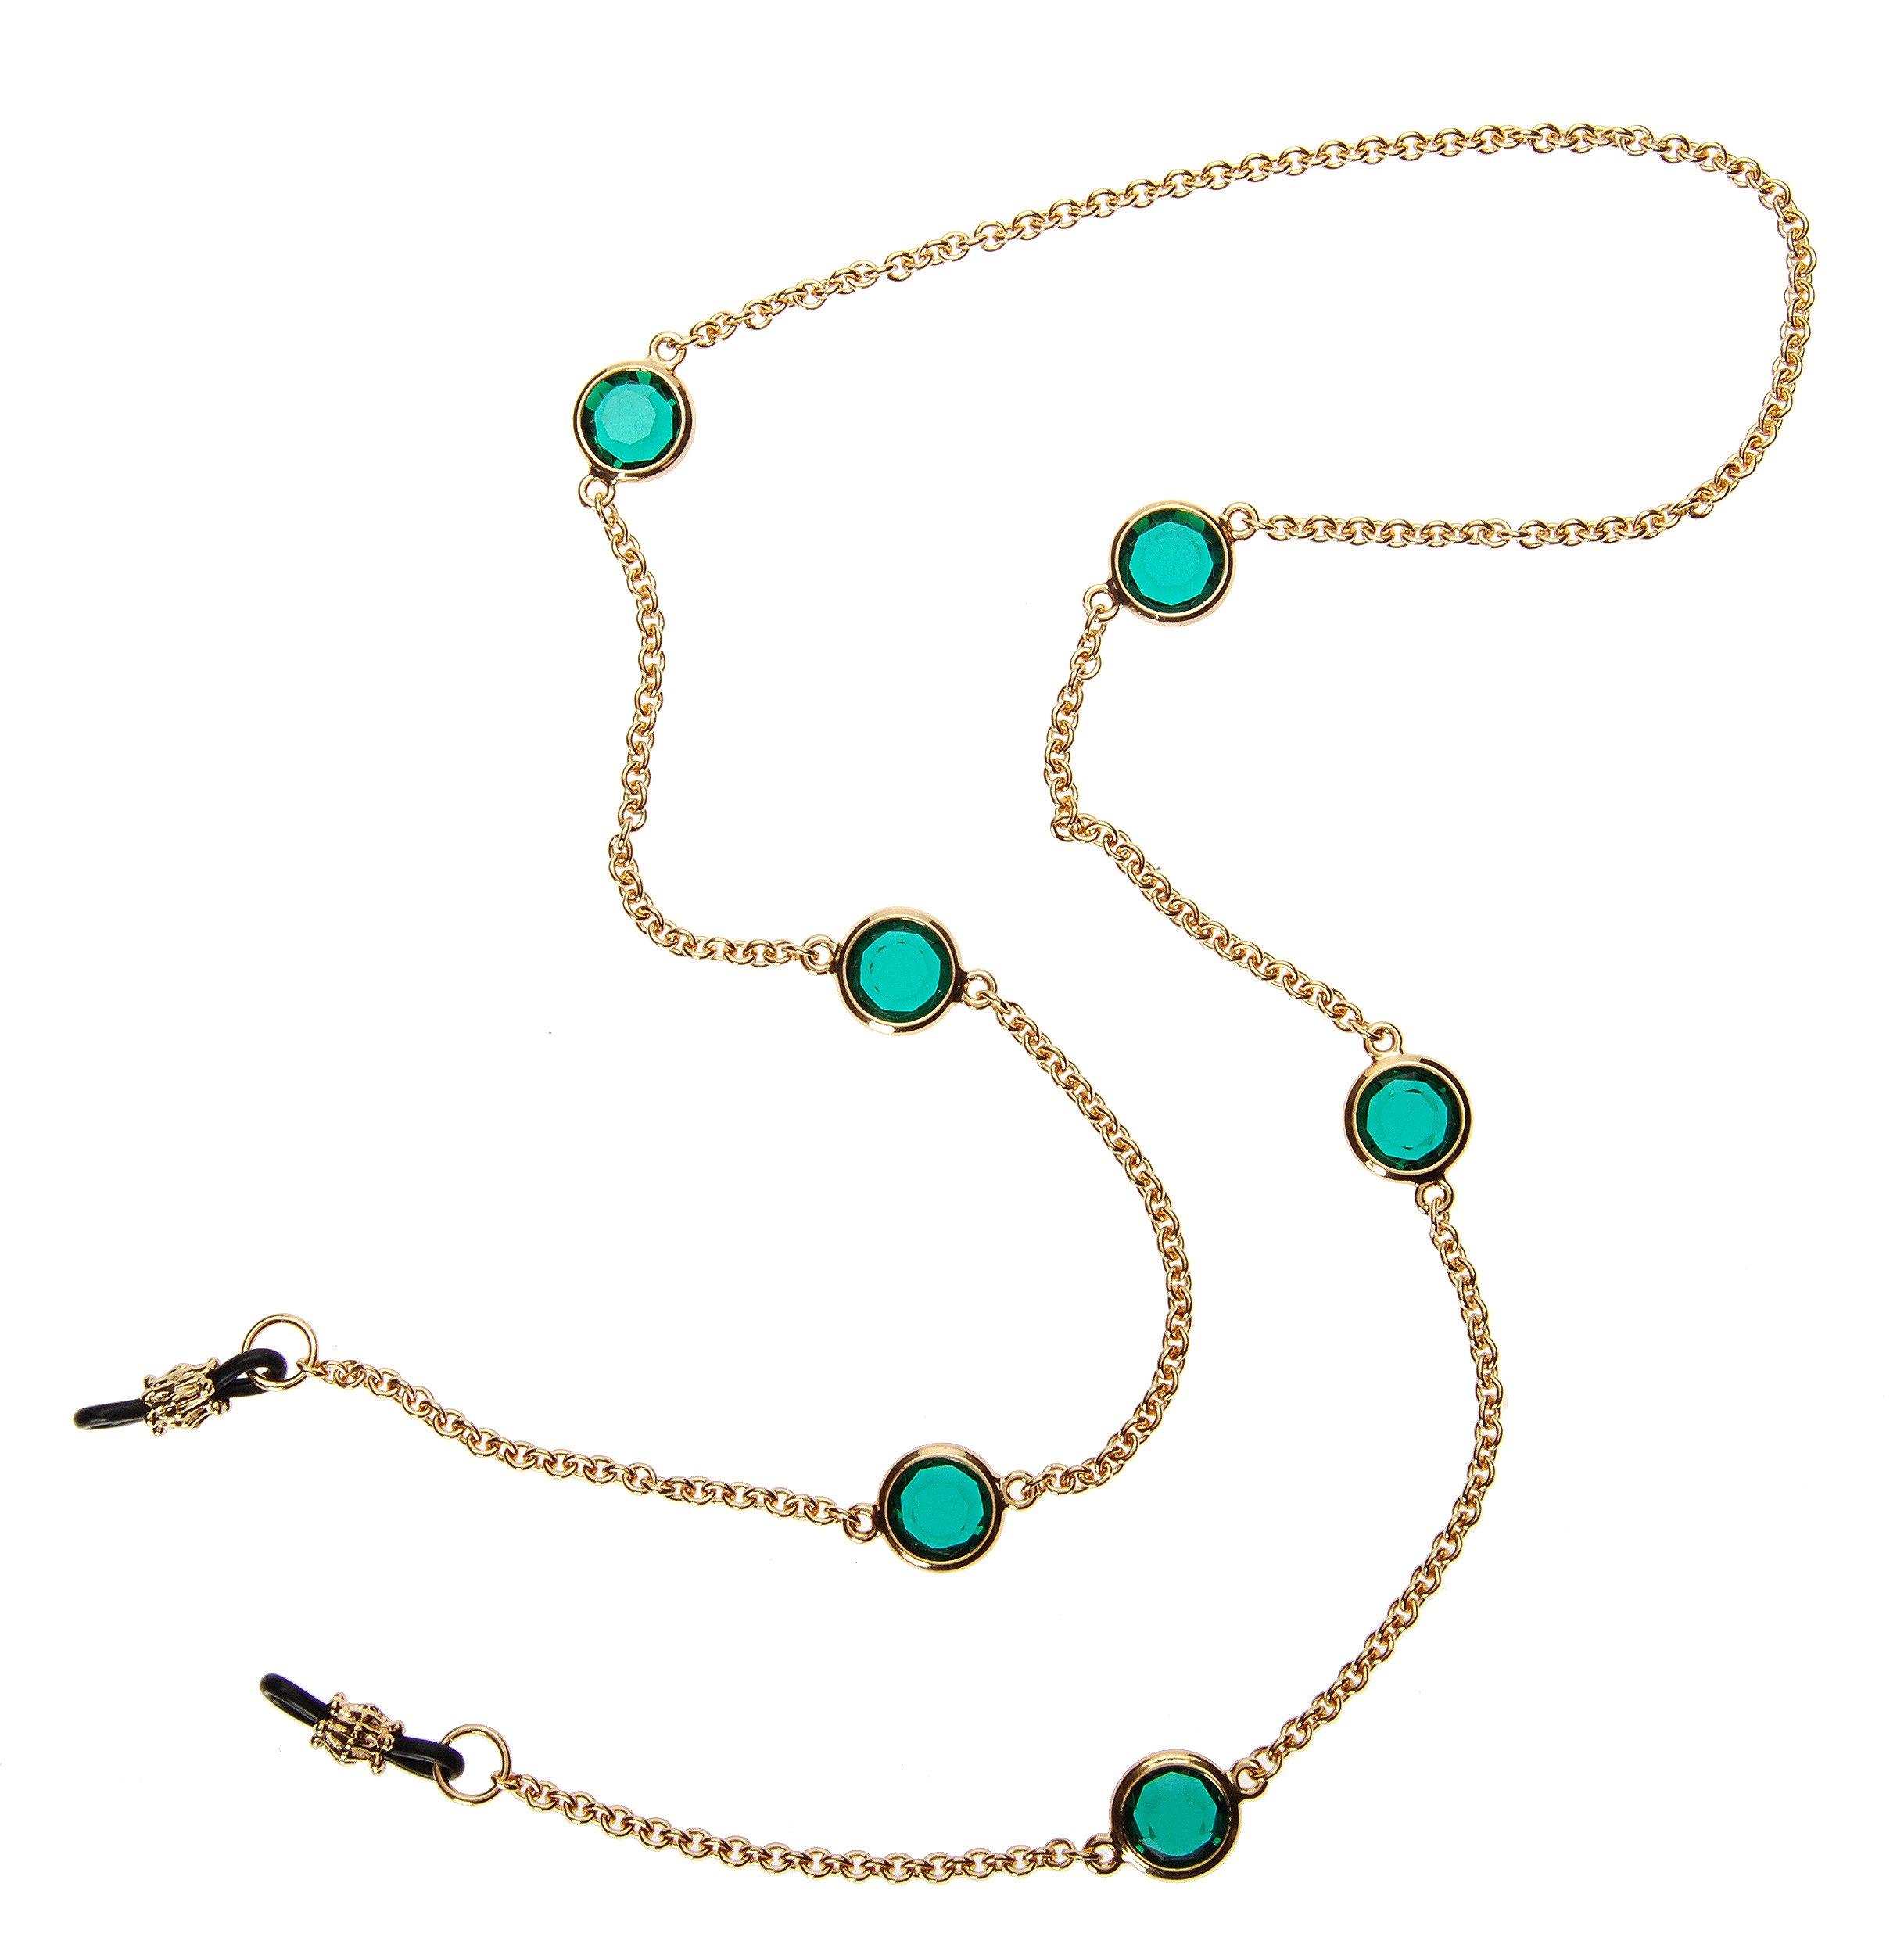 L. Erickson Charmer Eyeglass Chain - Emerald/Gold